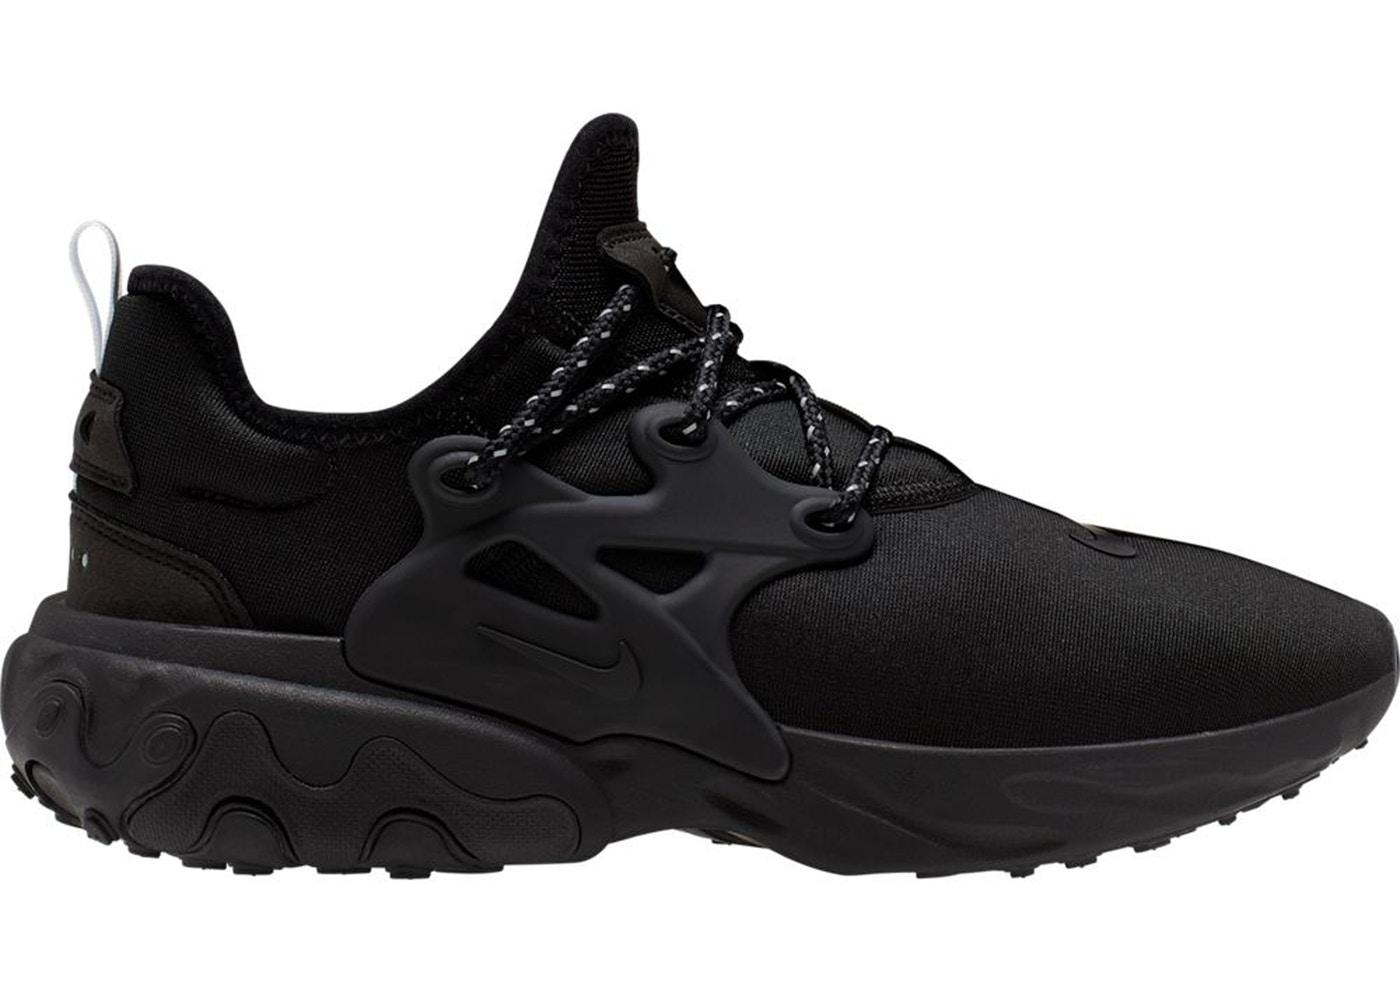 Nike Mens React Presto Running Shoes | eBay